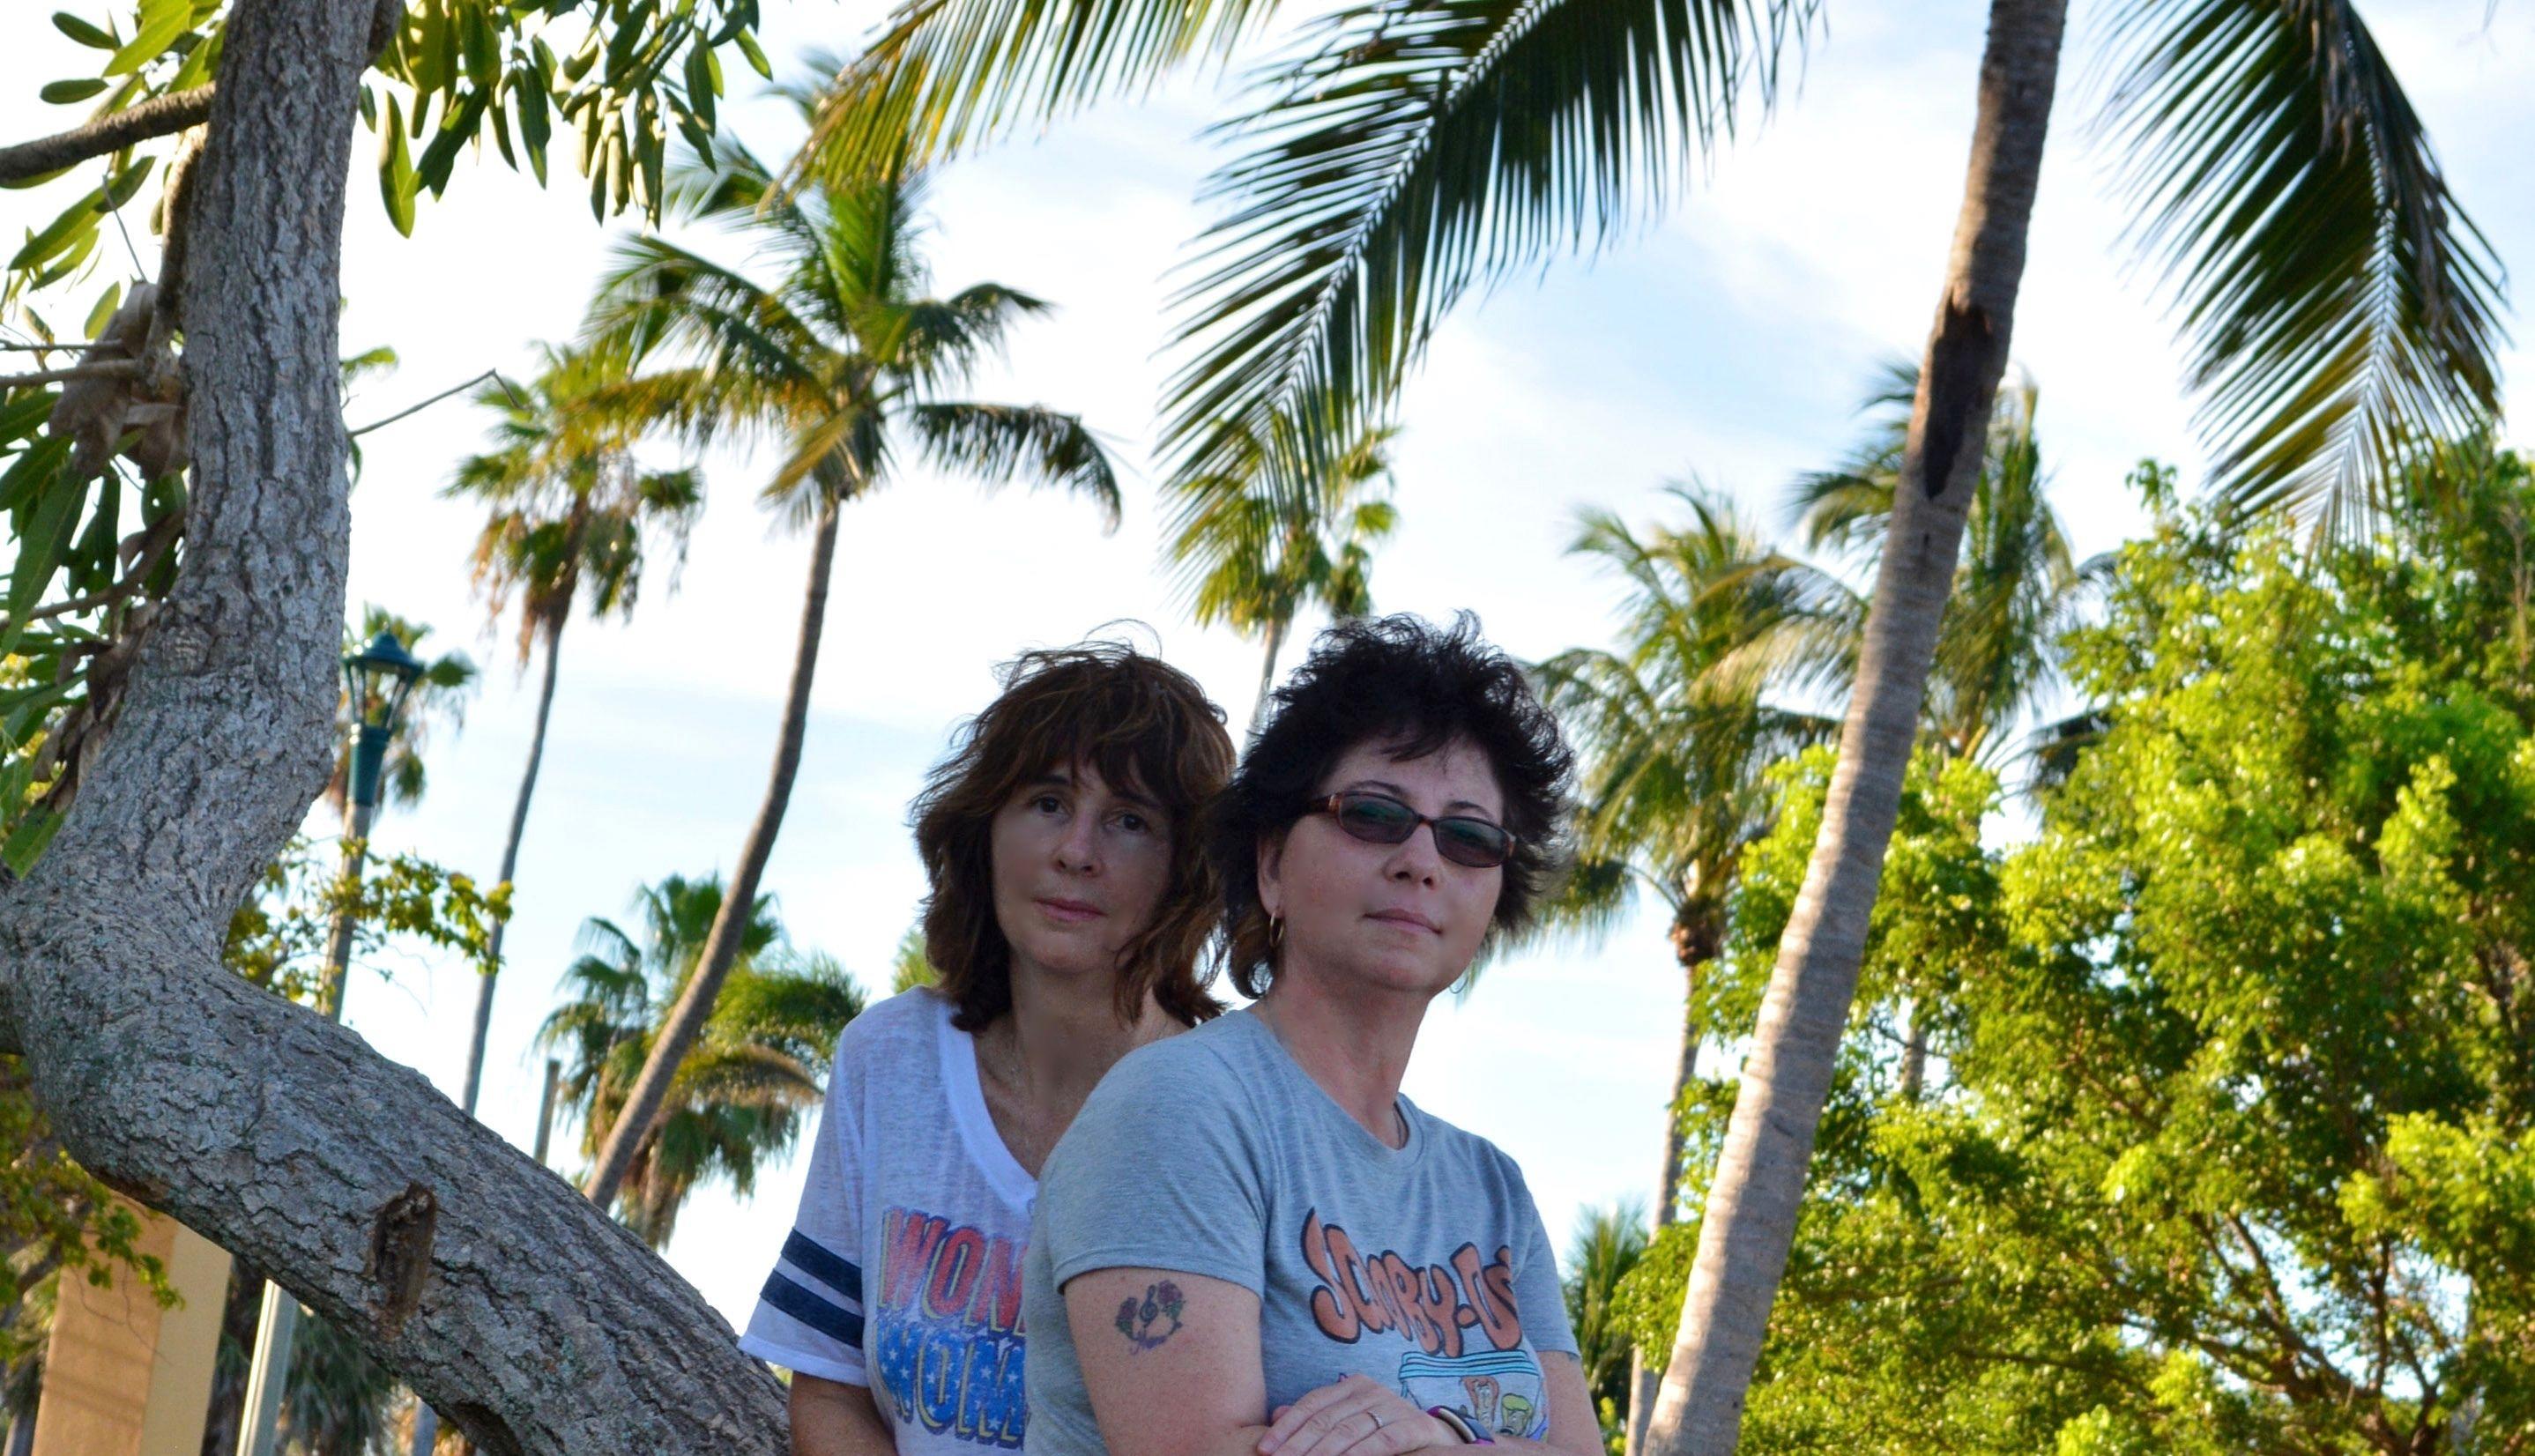 BLAST (Bi, Lesbian and Straight Together) Women of WPB